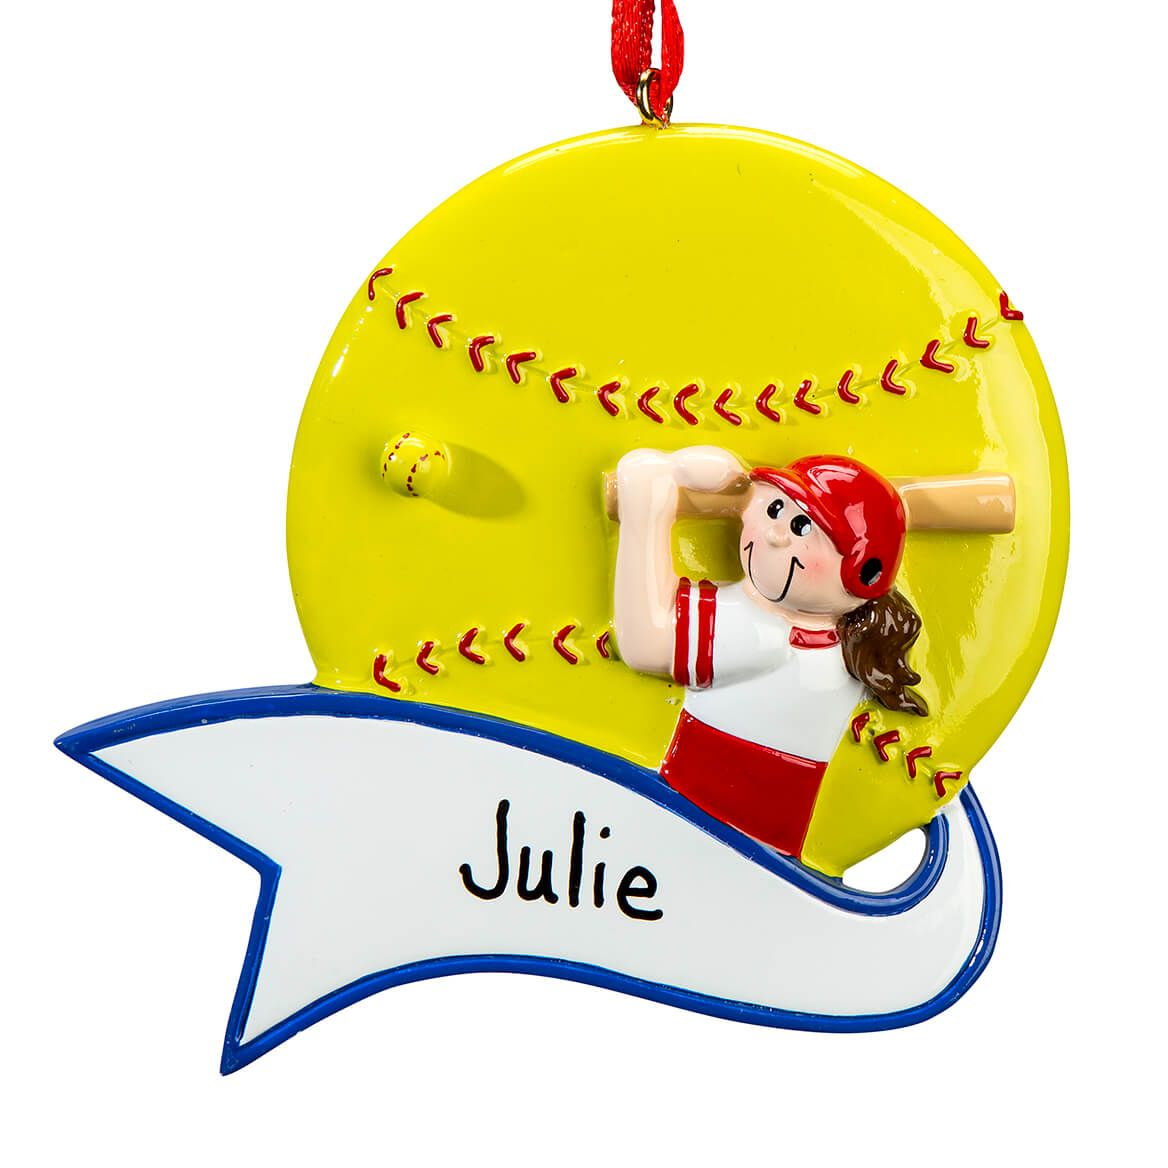 Personalized Softball Ornament-364919